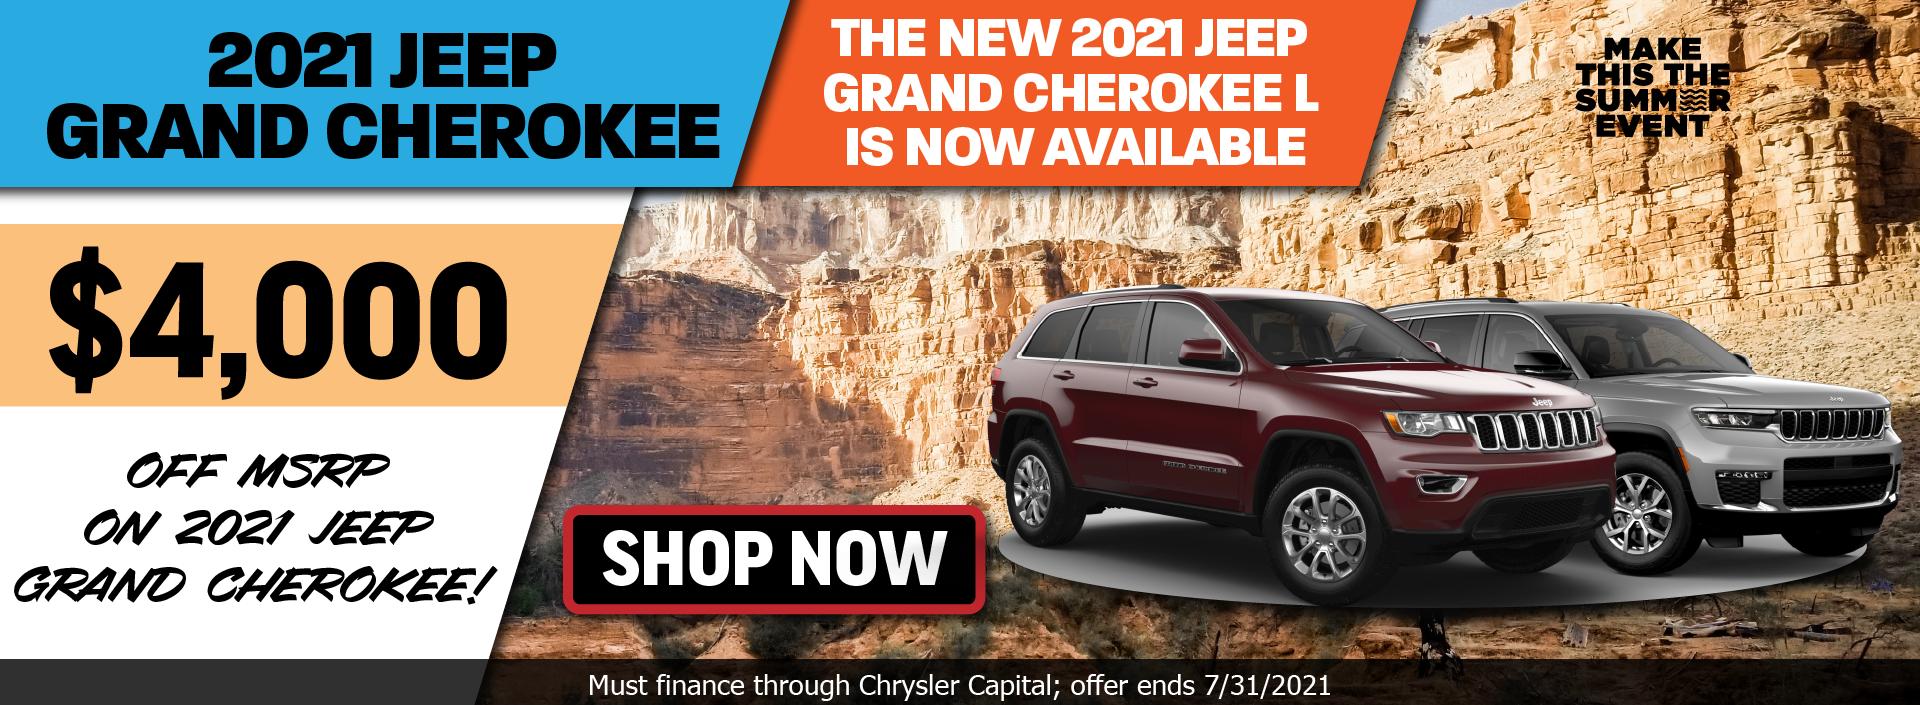 2021 Jeep Grand Cherokee_July 2021